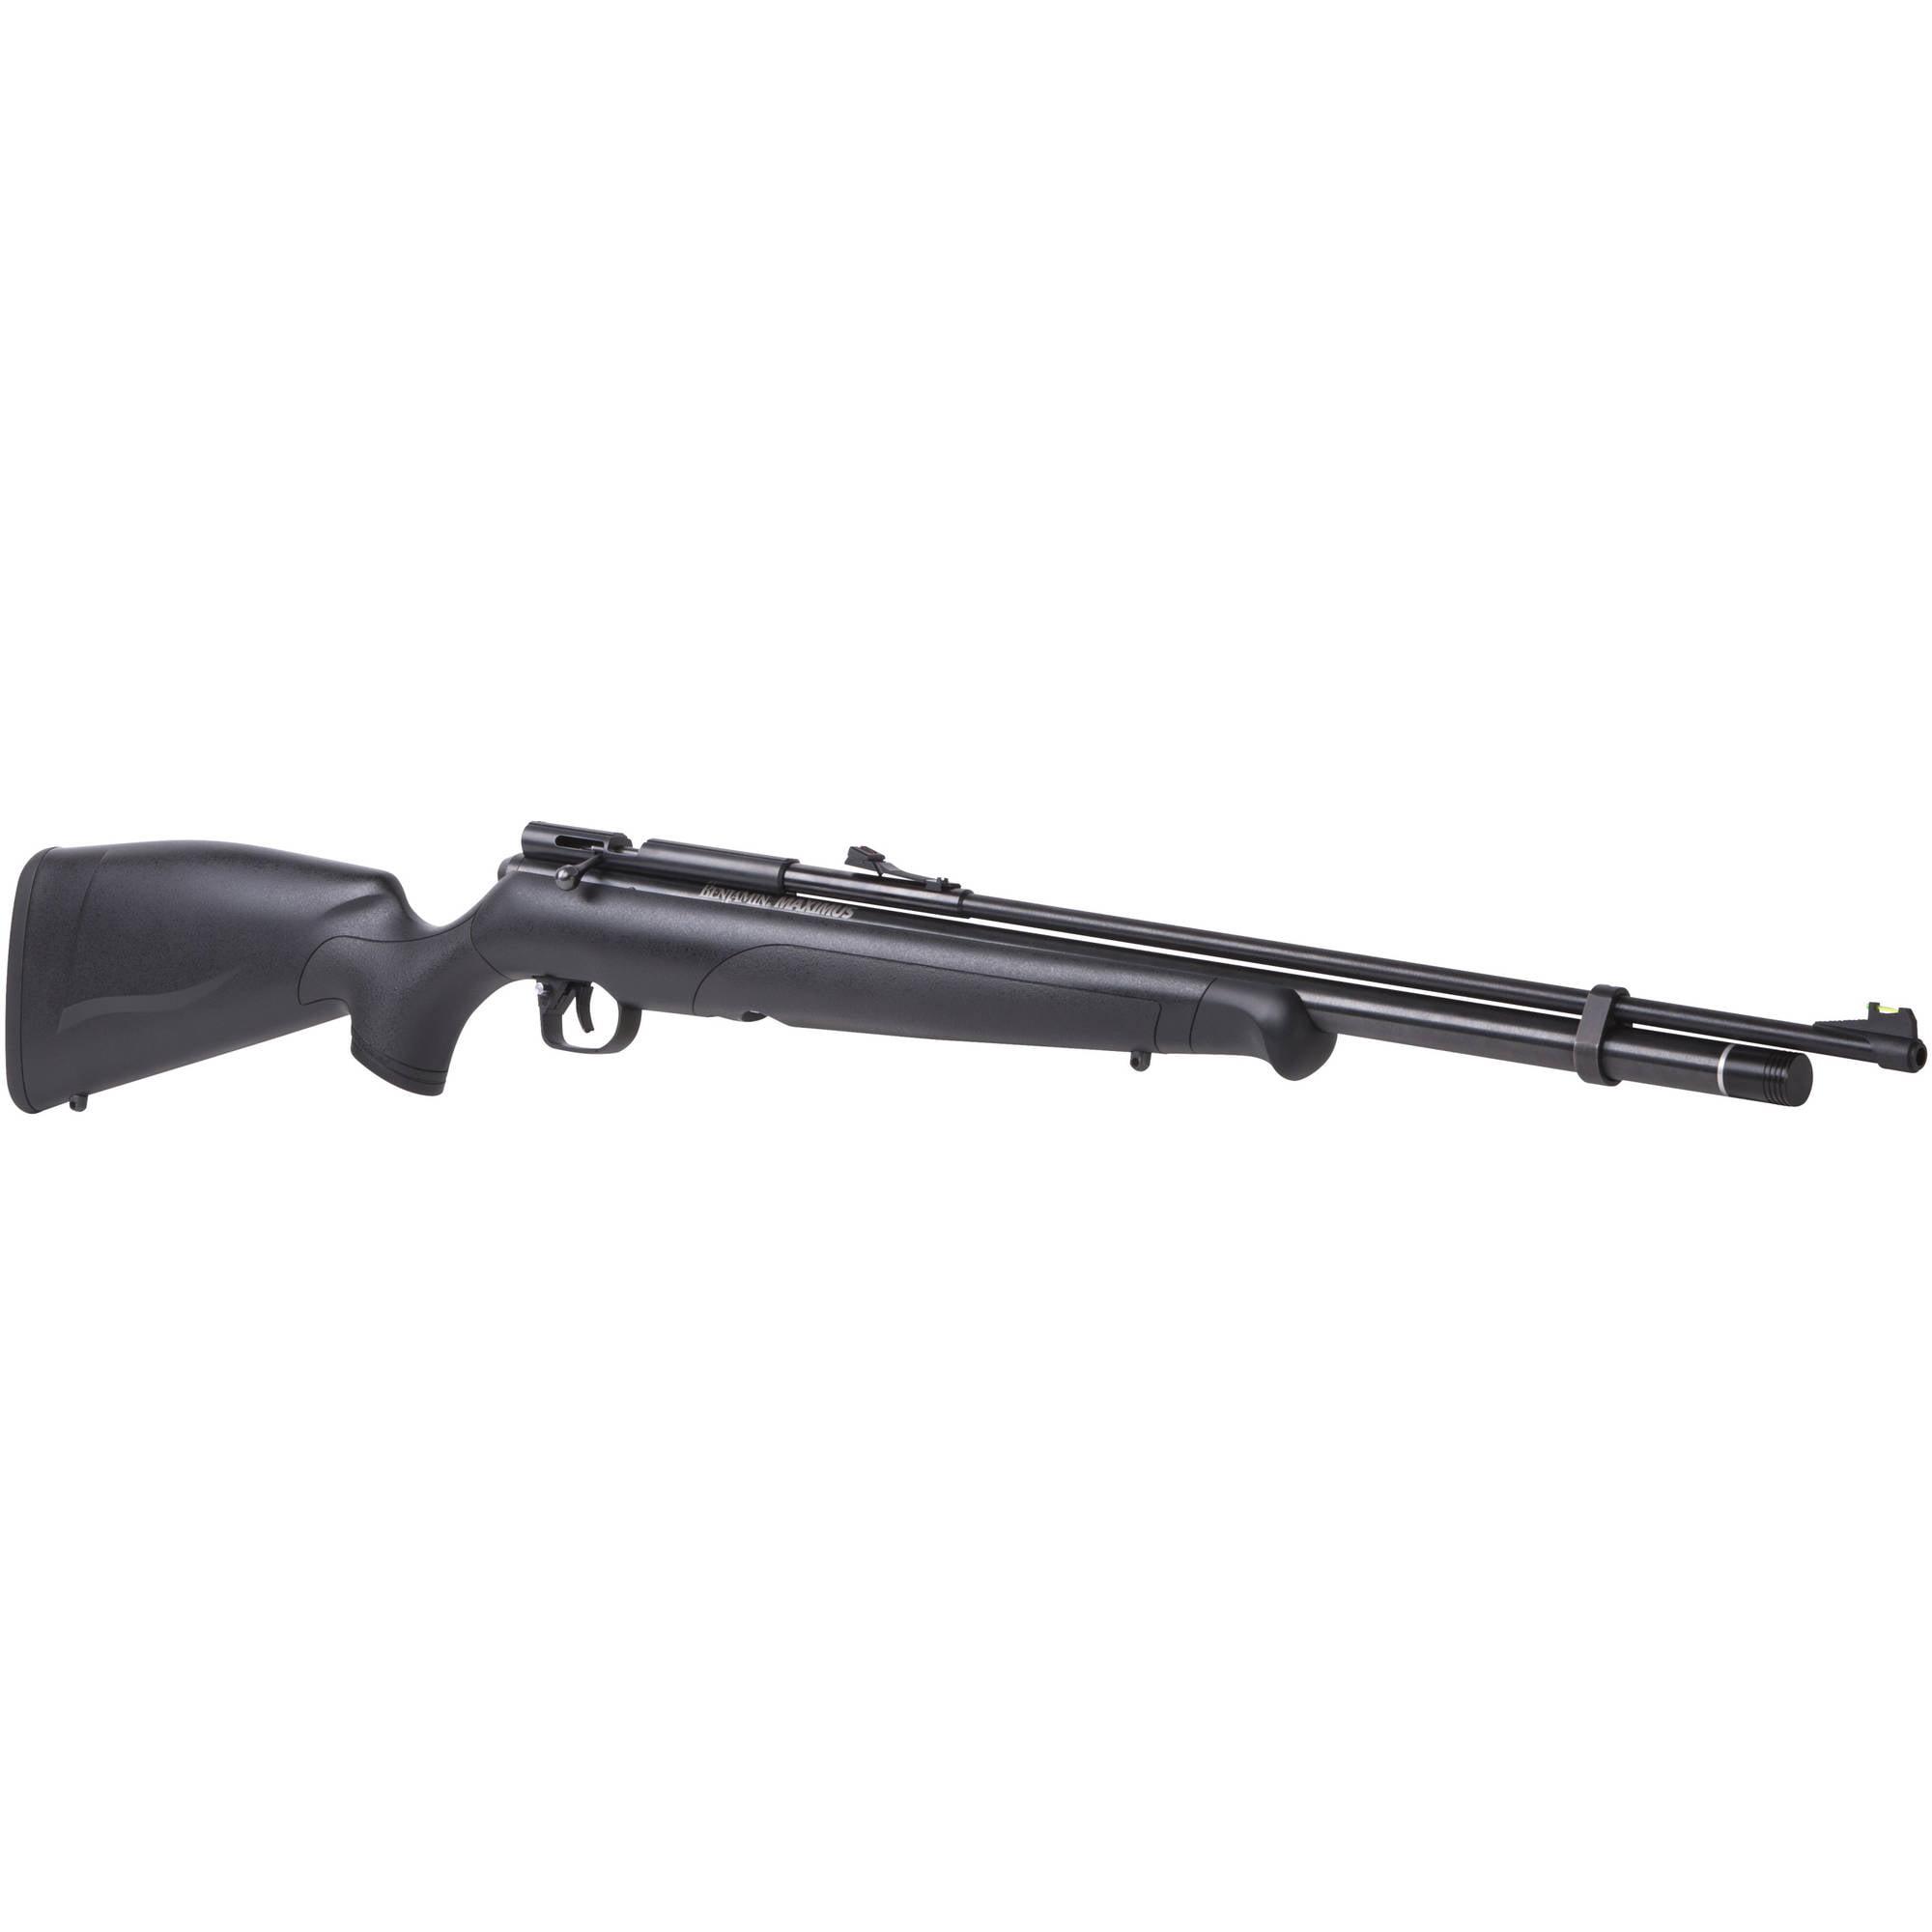 Benjamin Maximus .22 Caliber PCP Air Rifle, All-Weather Stock by Crosman Corporation